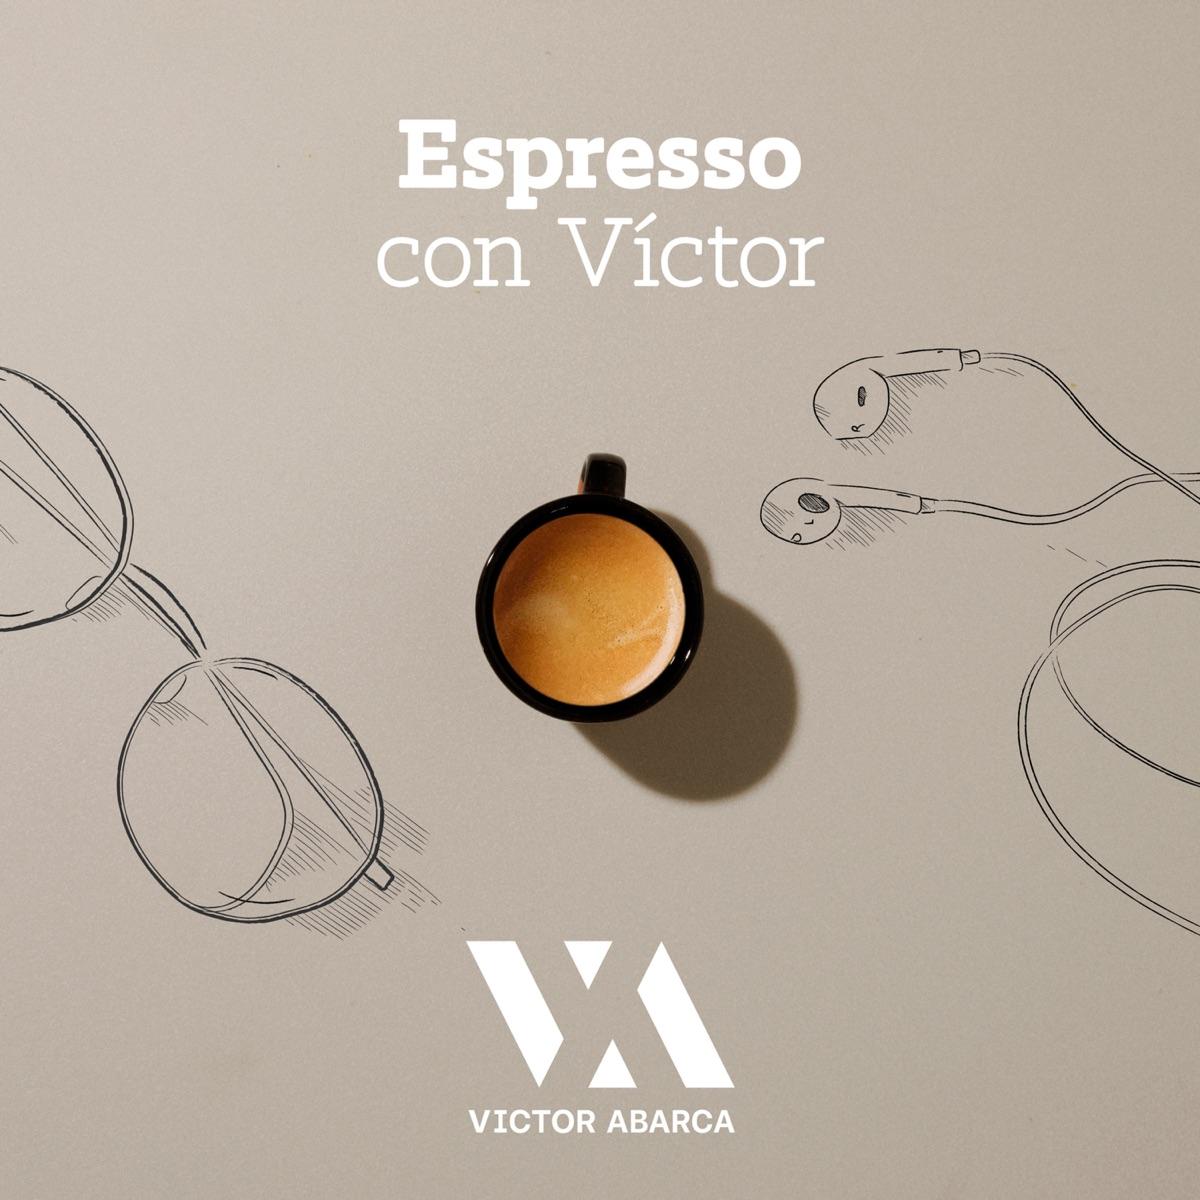 Espresso con Victor